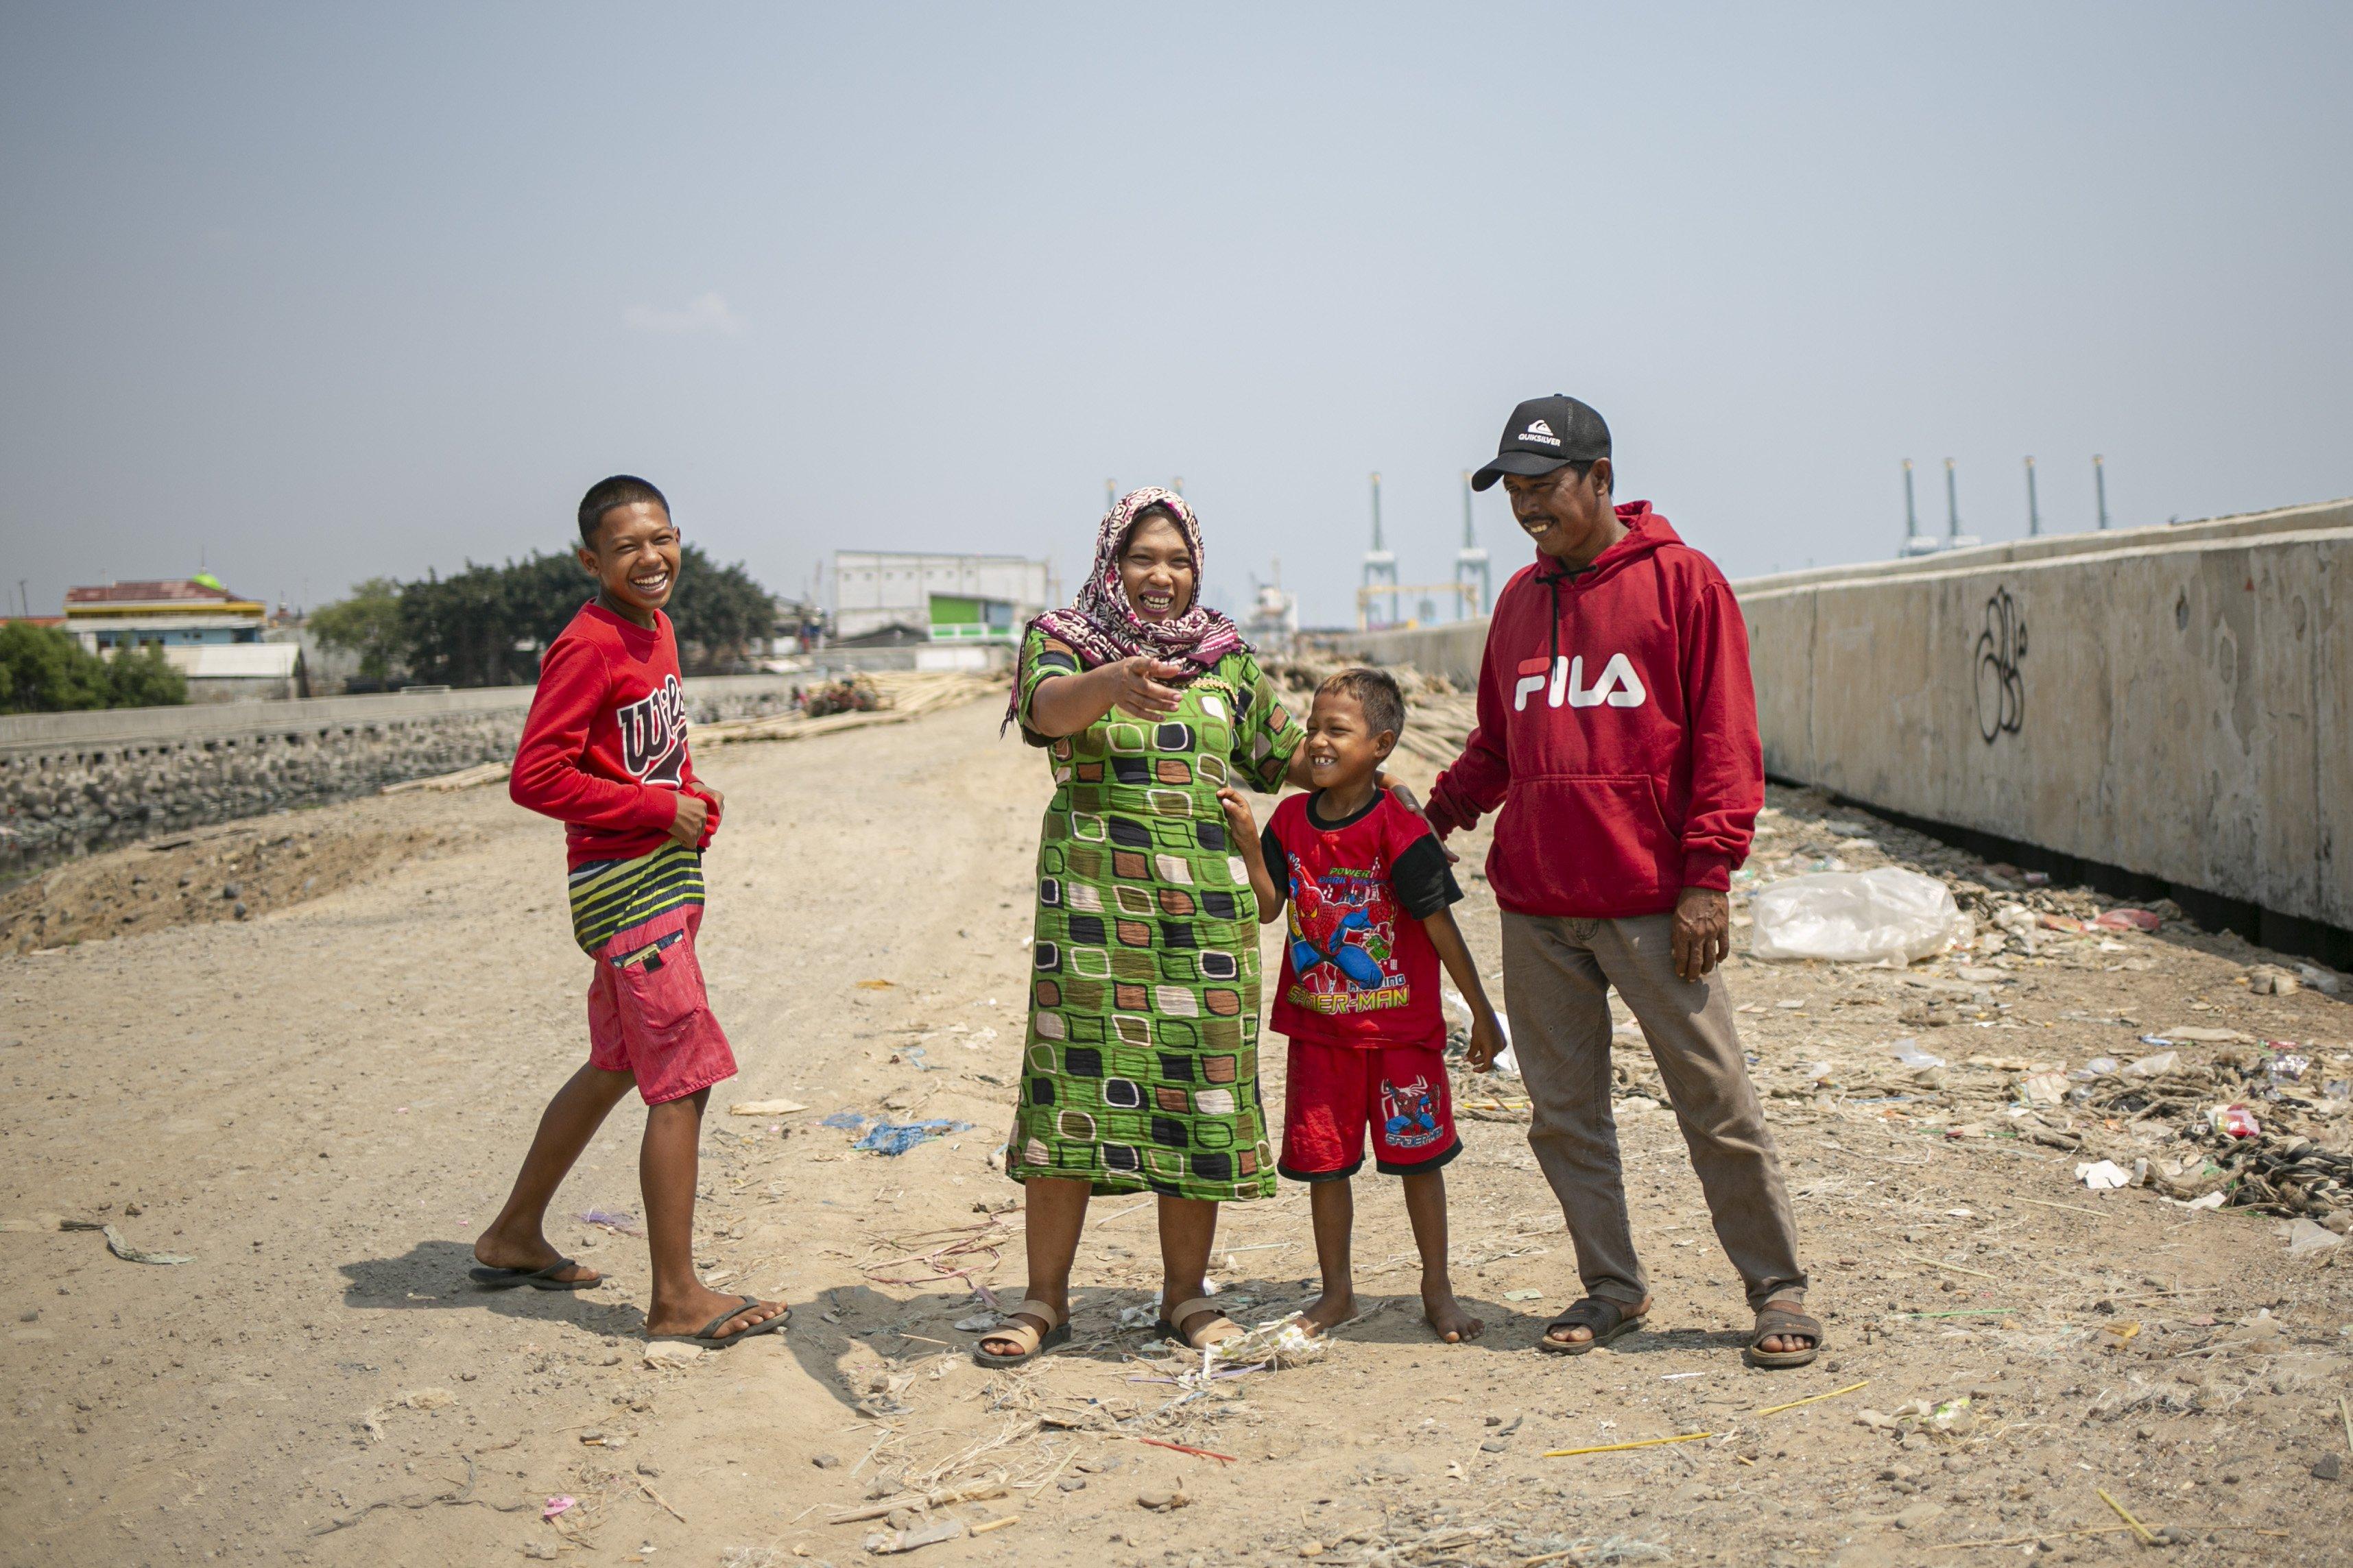 Potret keluarga Wadi (48), seorang nelayan yang tinggal di Kampung Nelayan, Jakarta Utara, Minggu (9/8/2020).